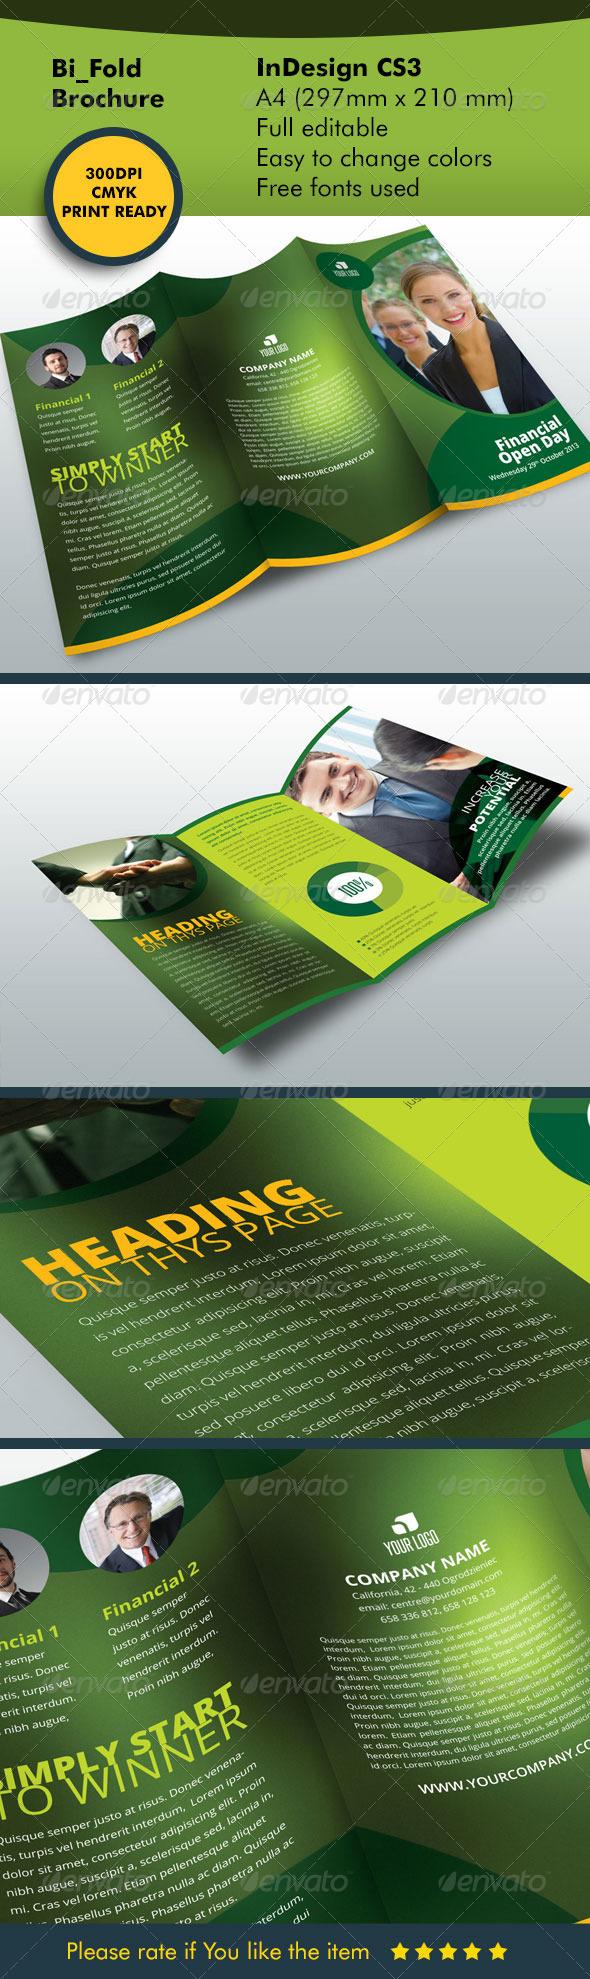 Tri-fold Brochure Corporate